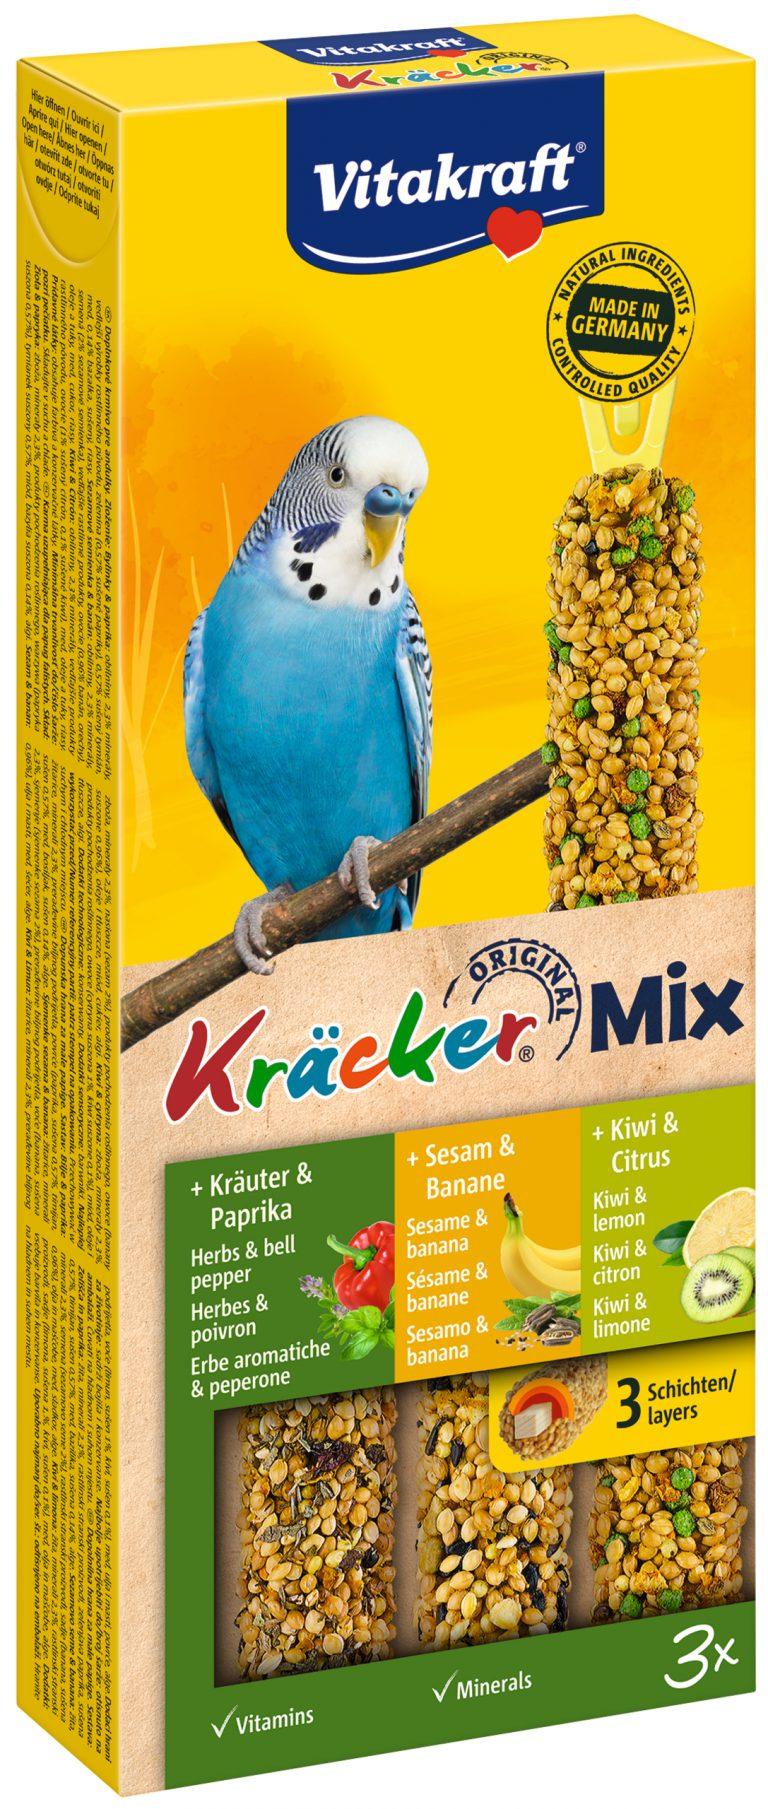 Vitakraft Kracker Mix Parkiet Kruiden/Banaan/Kiwi